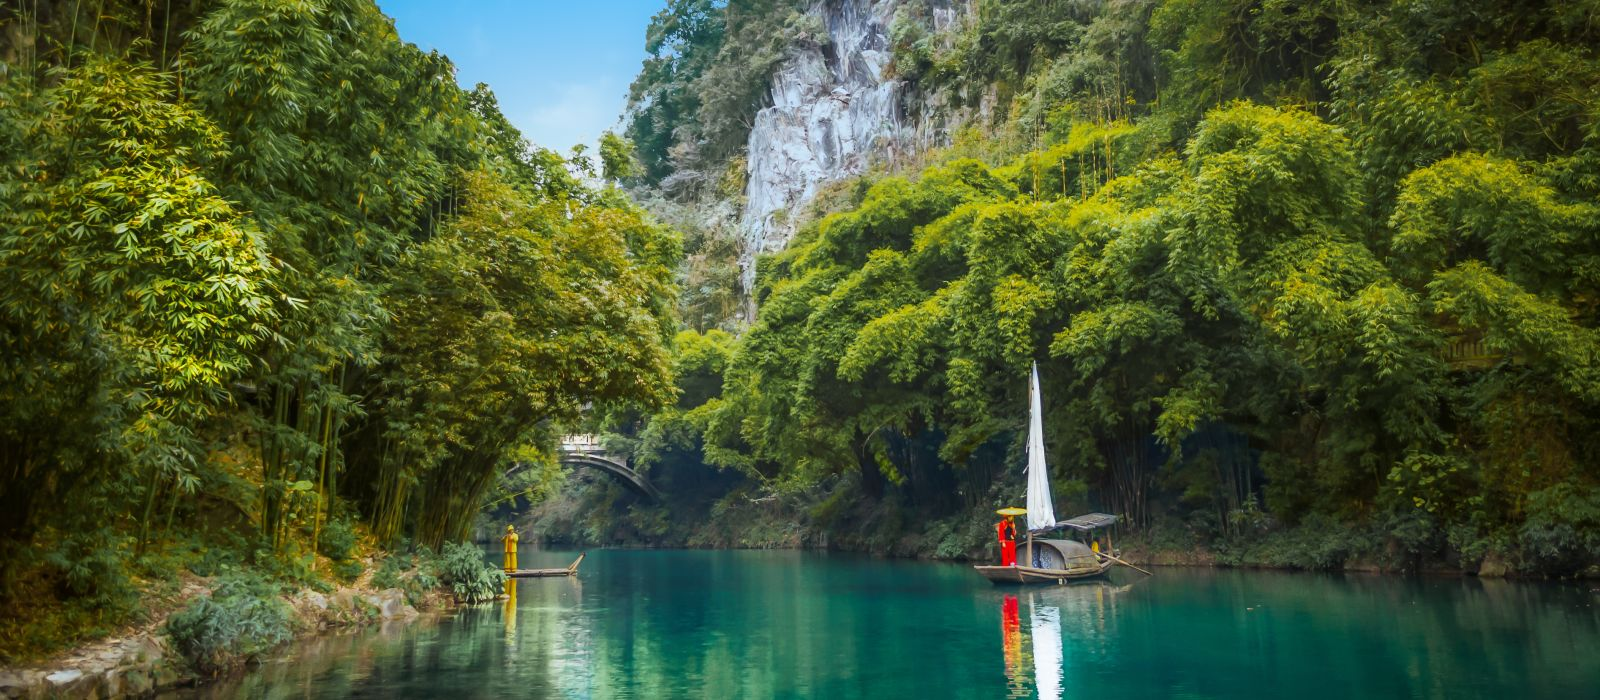 Imperial Cities, Tibet & Yangtze River Cruise Tour Trip 4